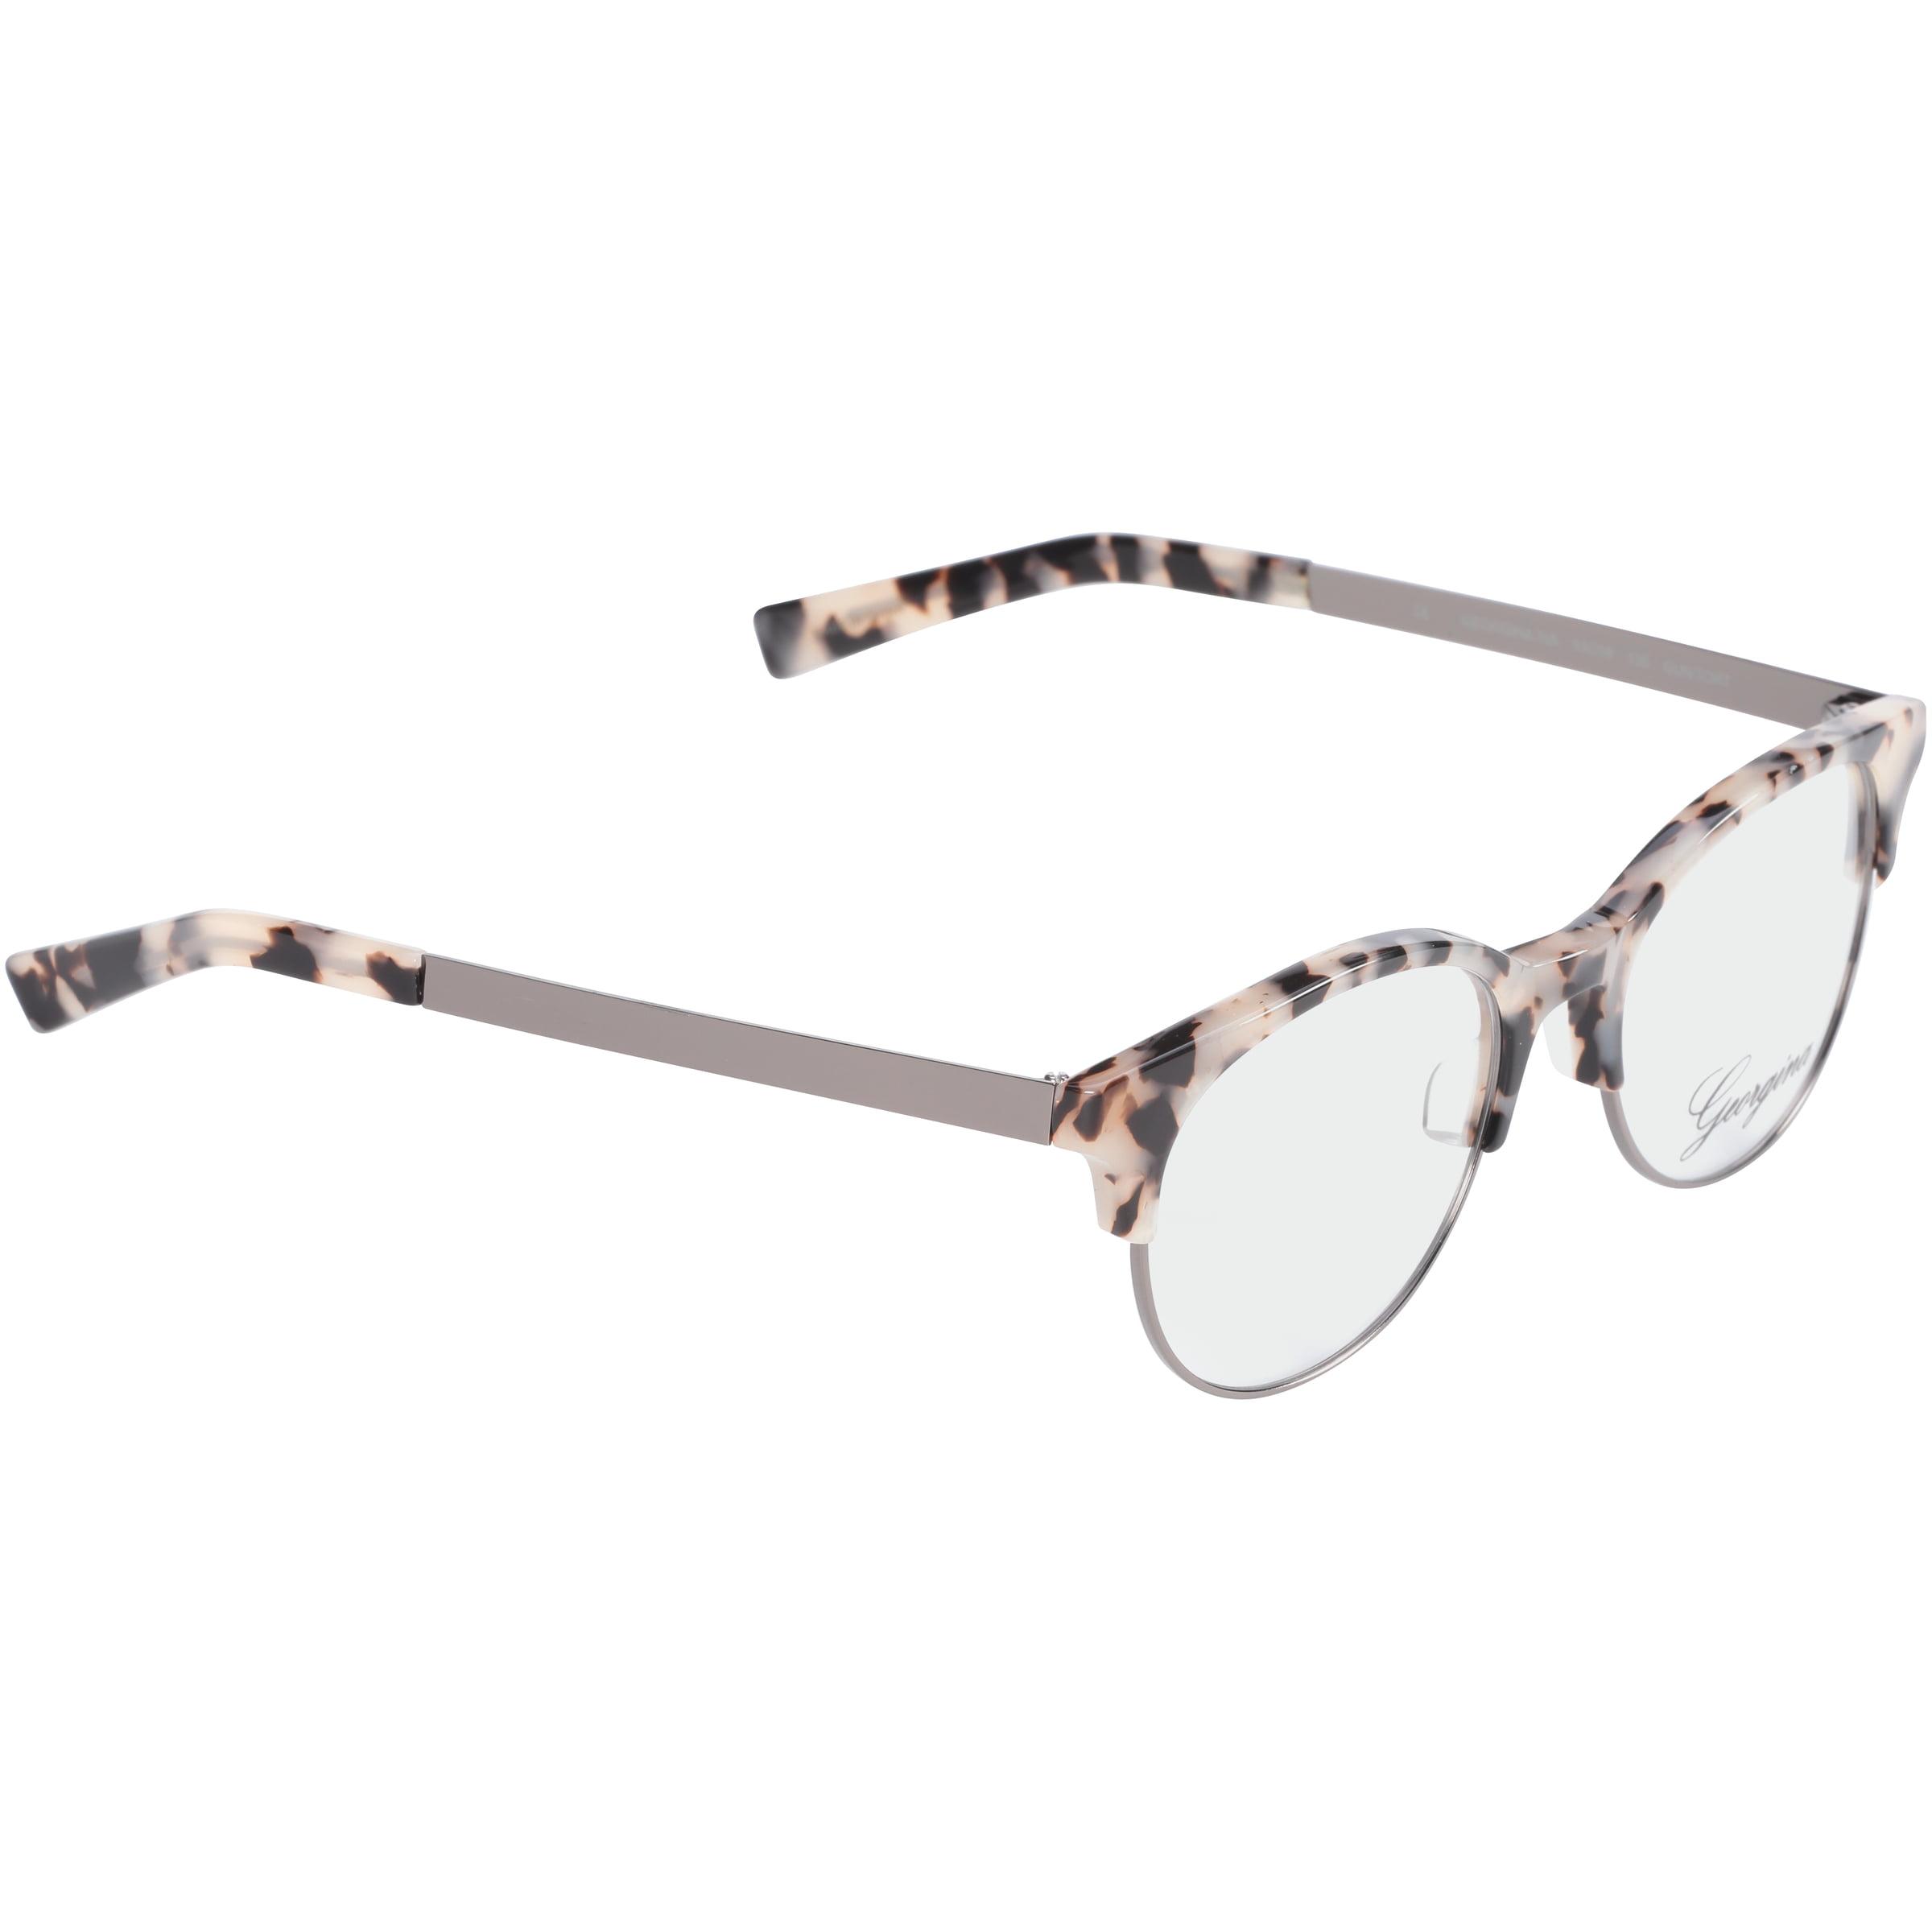 767d3f7989c3 Georgina Eyewear Rx-able Eyeglass Frames 705 Gun Tortoise - Walmart.com